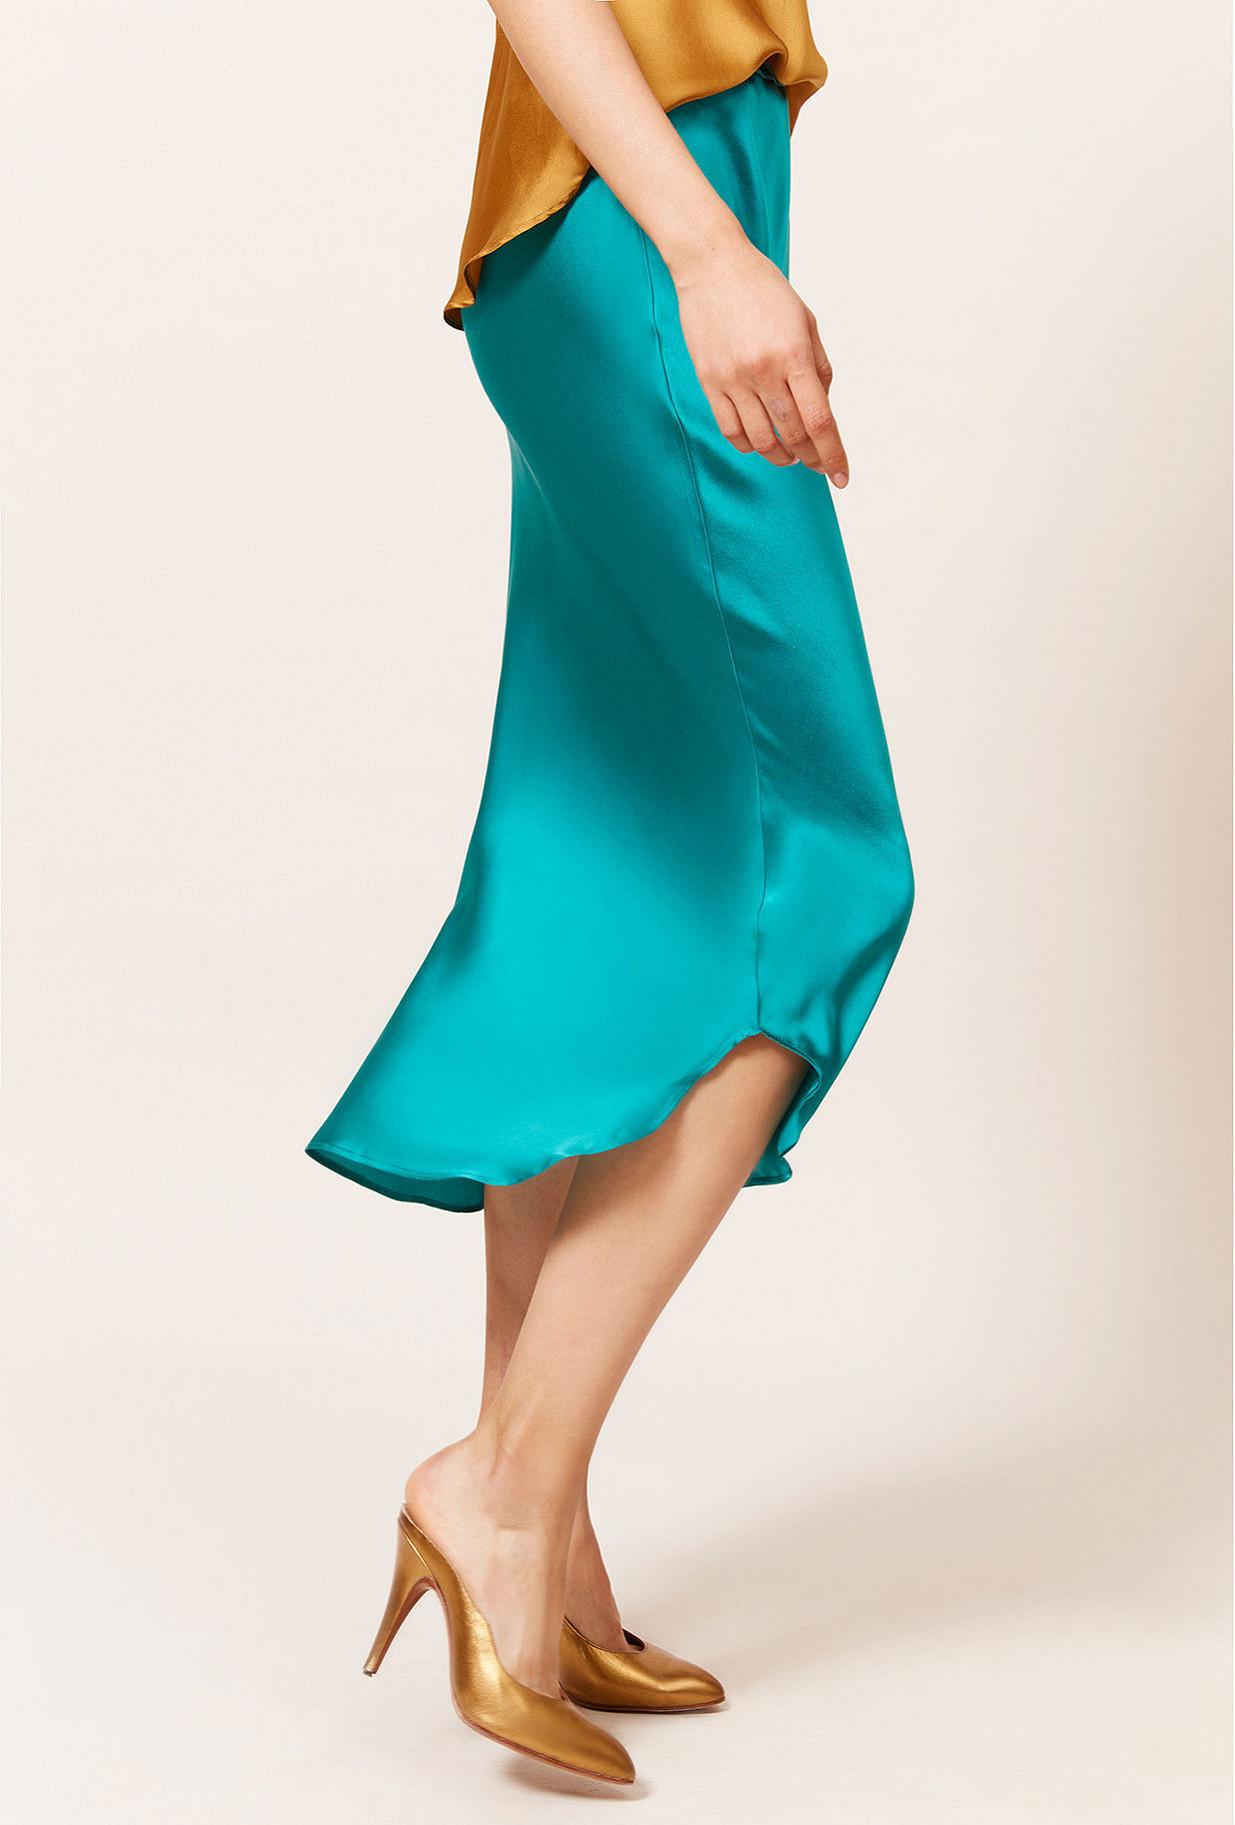 Turquoise Skirt Nami